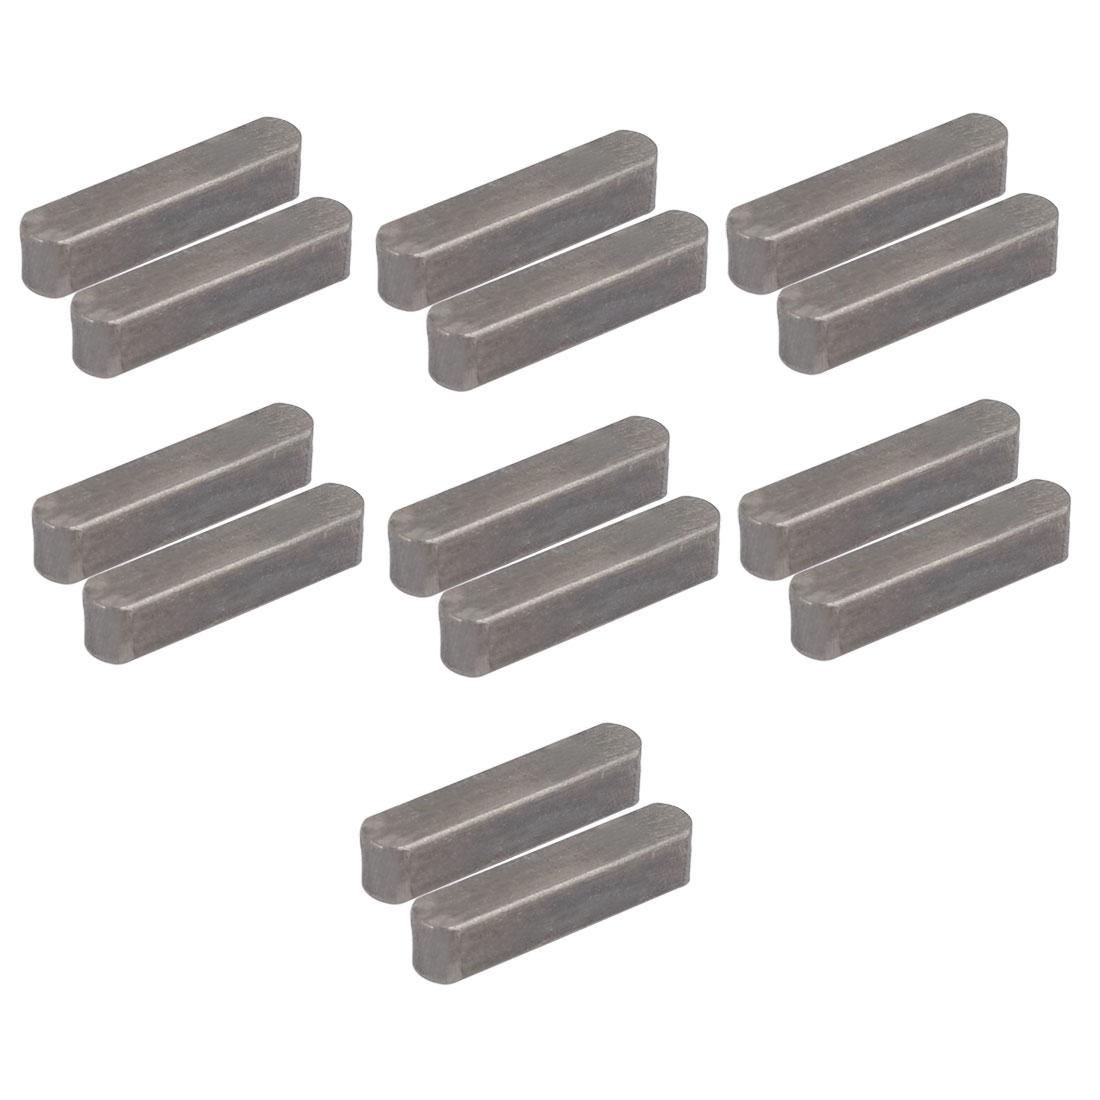 28mmx6mmx6mm Carbon Steel Key Stock To Lock Pulleys 14pcs